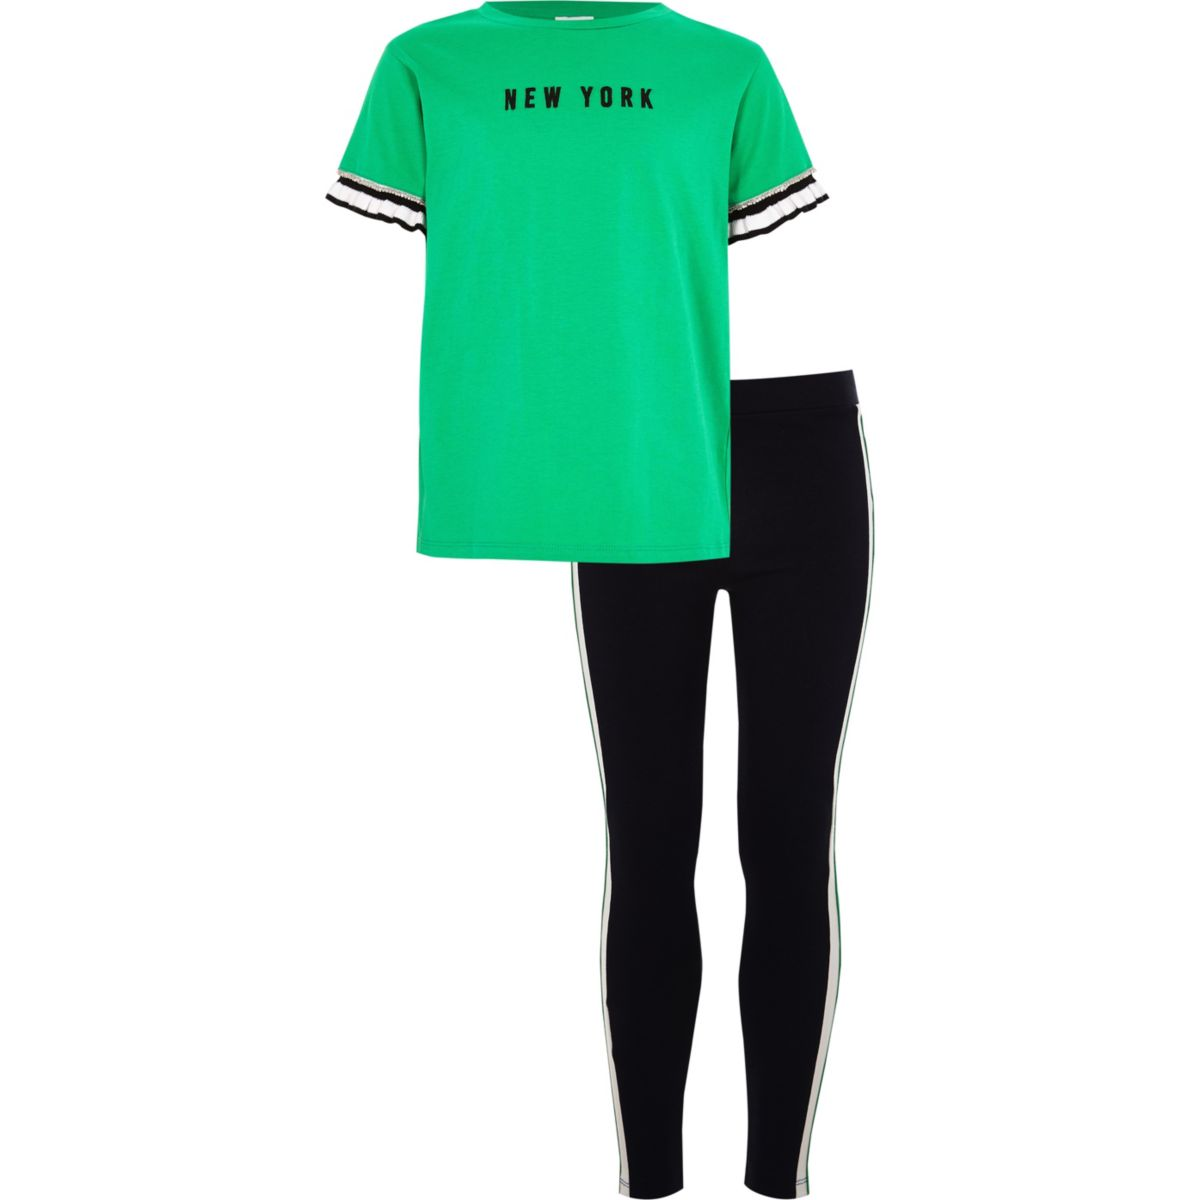 Girls green 'New York' T-shirt outfit